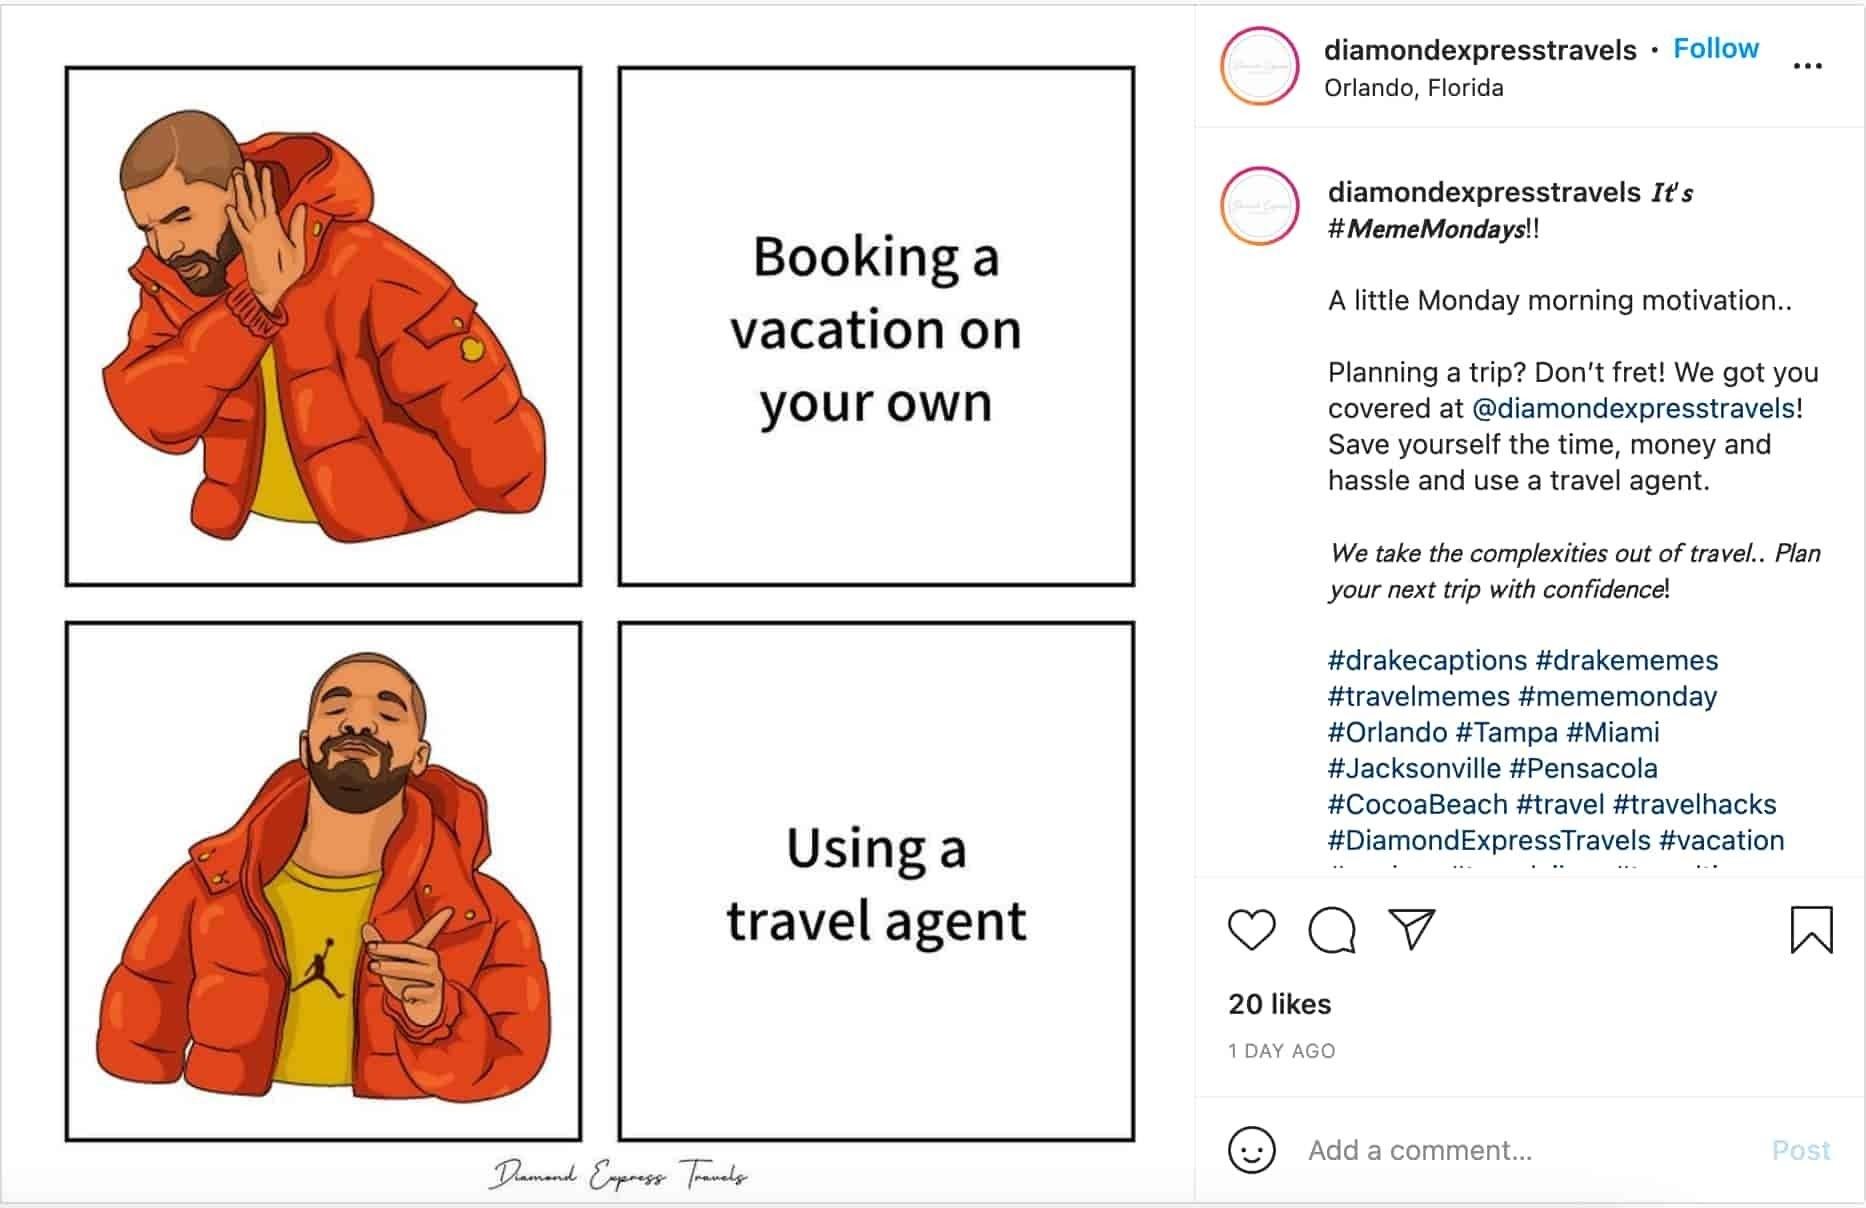 meme marketing example by Diamond Express Travels